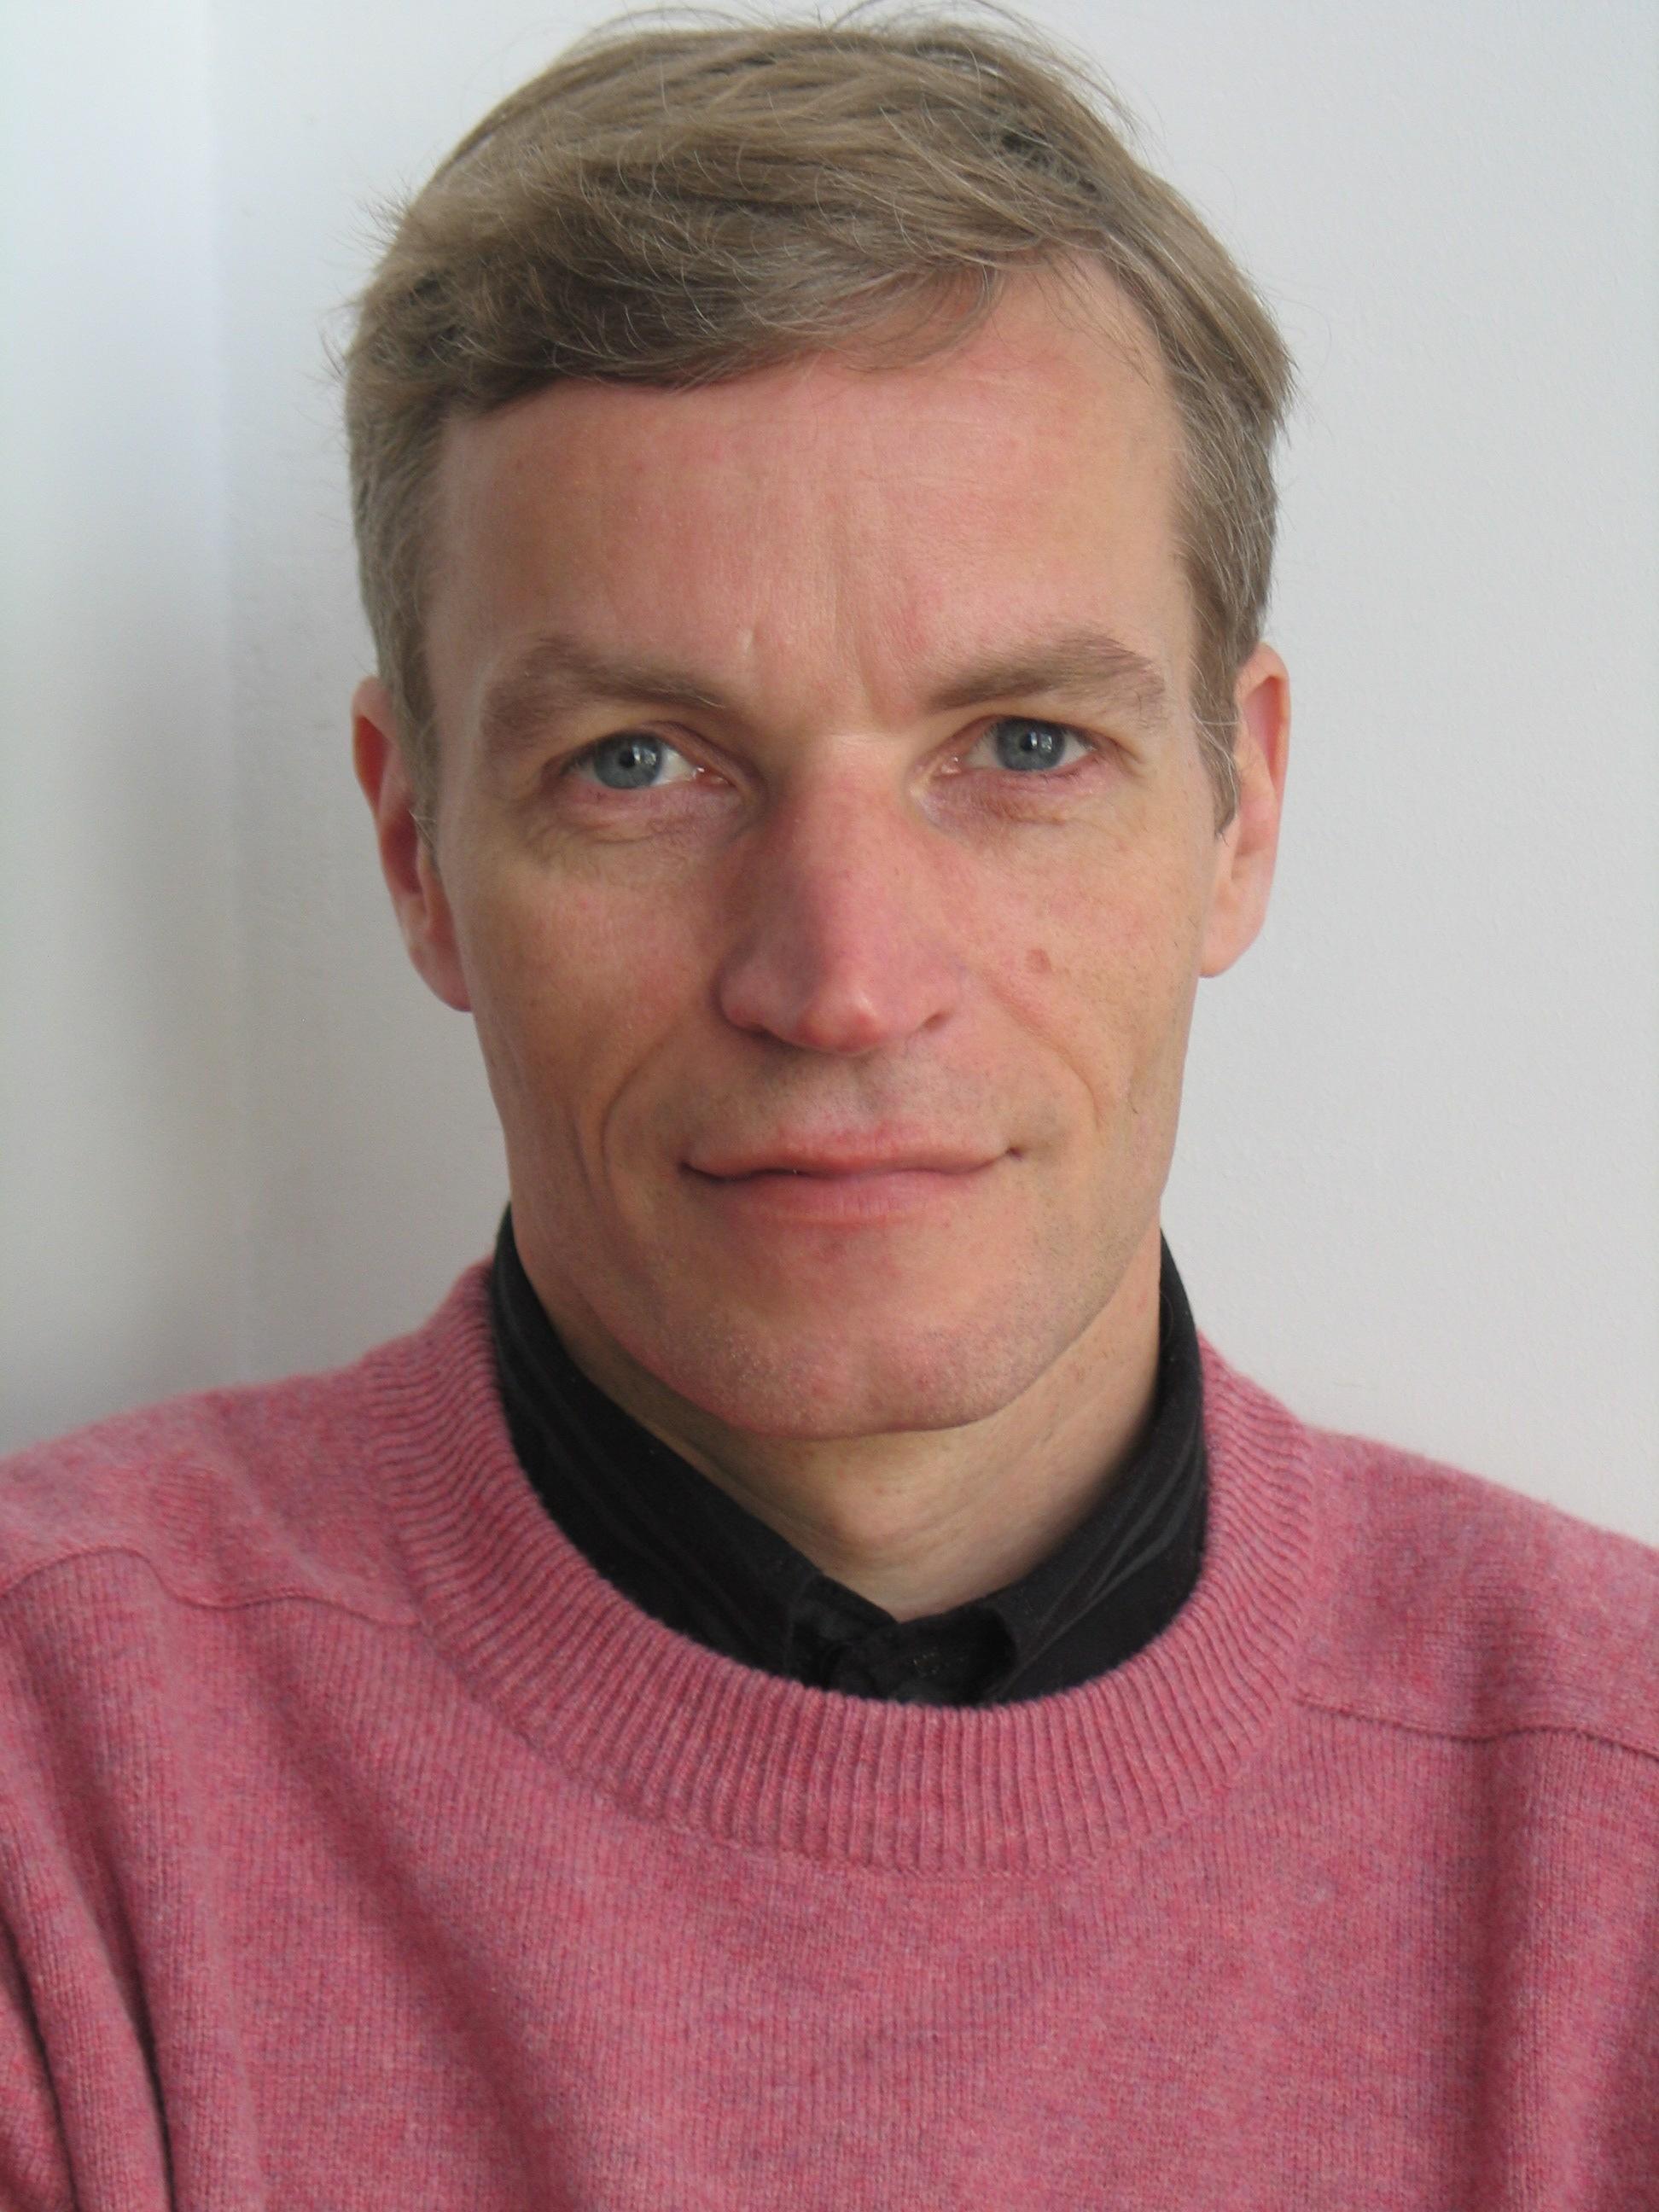 Dirk Zwart, 2006